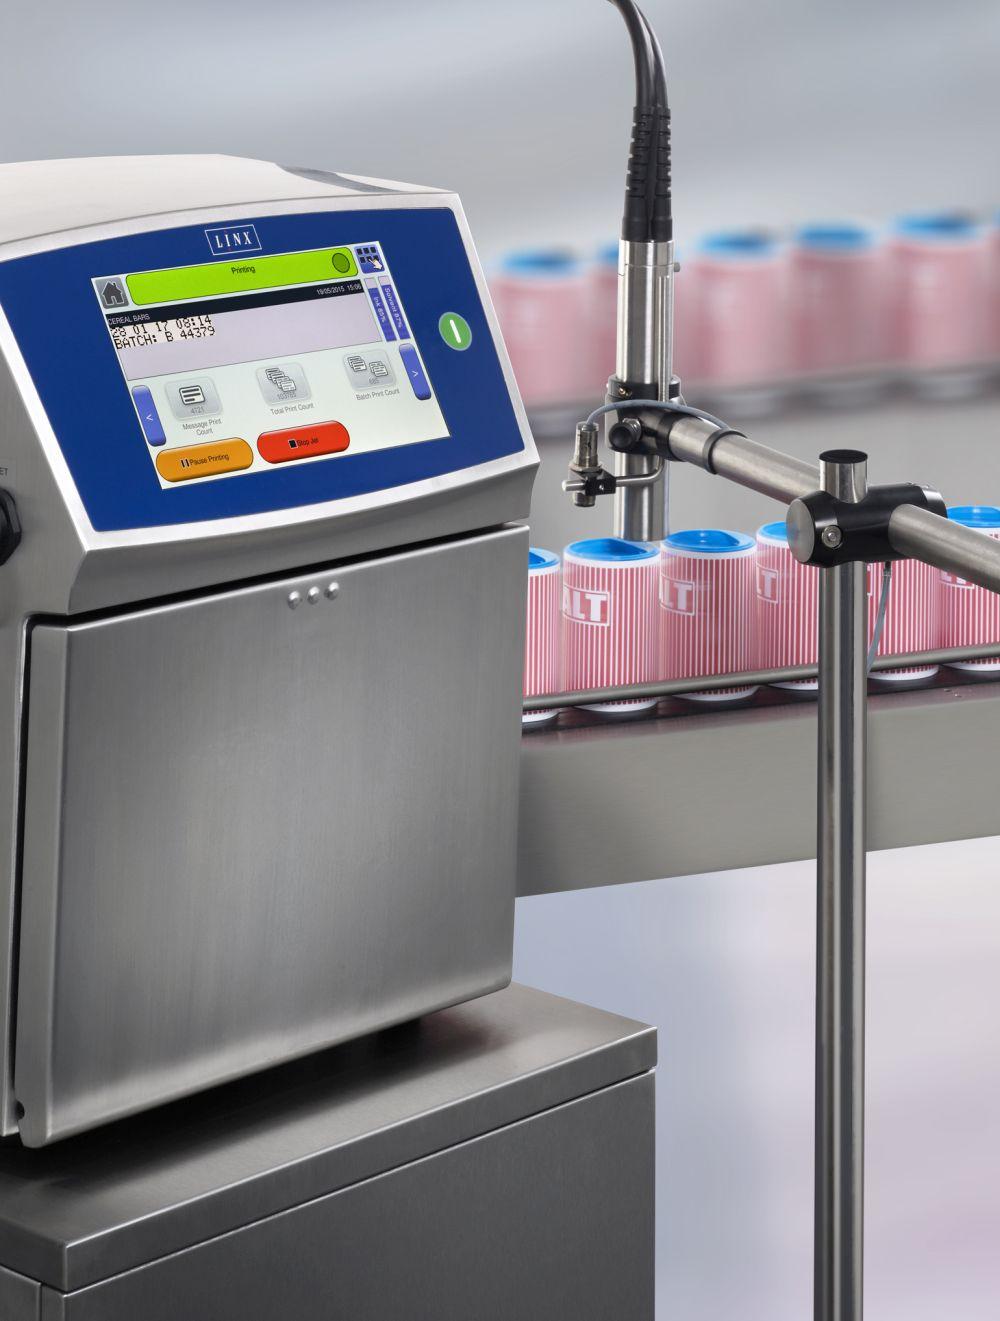 LX3049 - Новые возможности принтеров LINX серии 8900